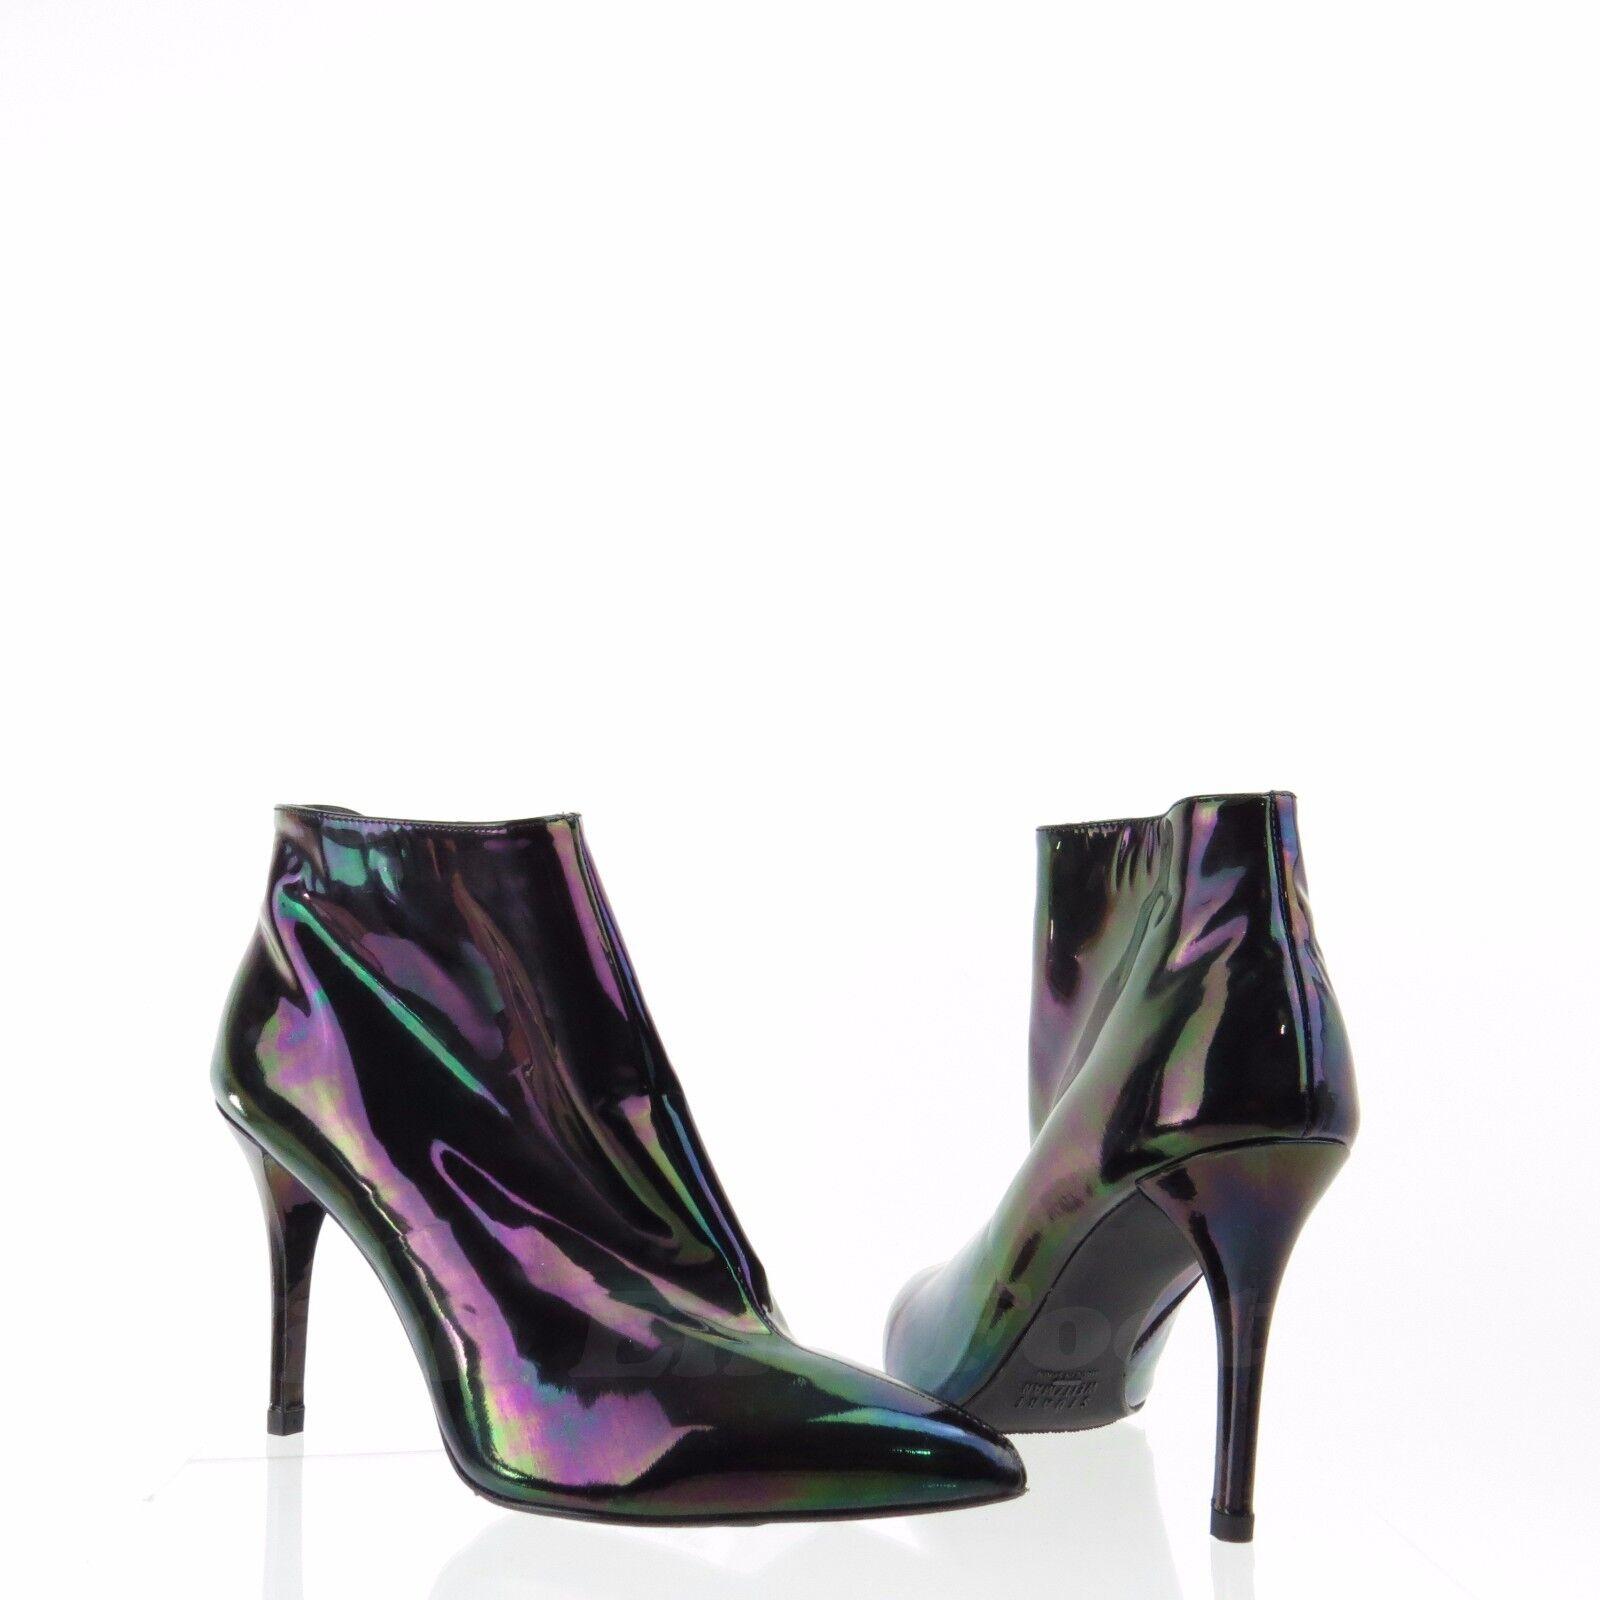 Stuart Weitzman Carltone Women's shoes Black Metallic Booties Size 7 M New  475